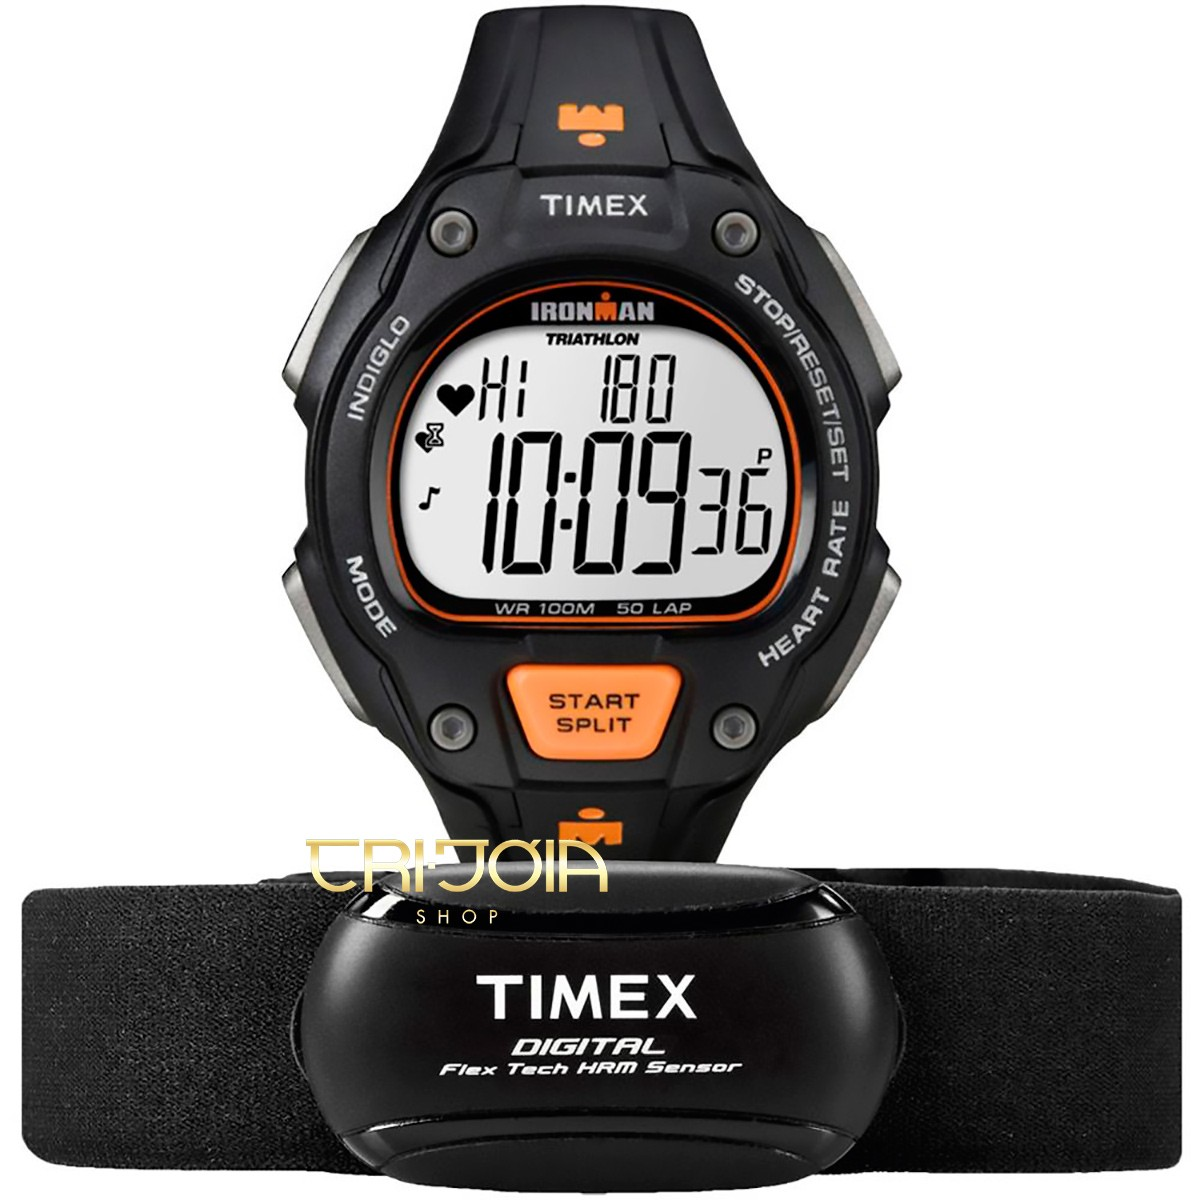 ef32dc18da5 Relógio Timex H F IronMan Road Trainer T5K720